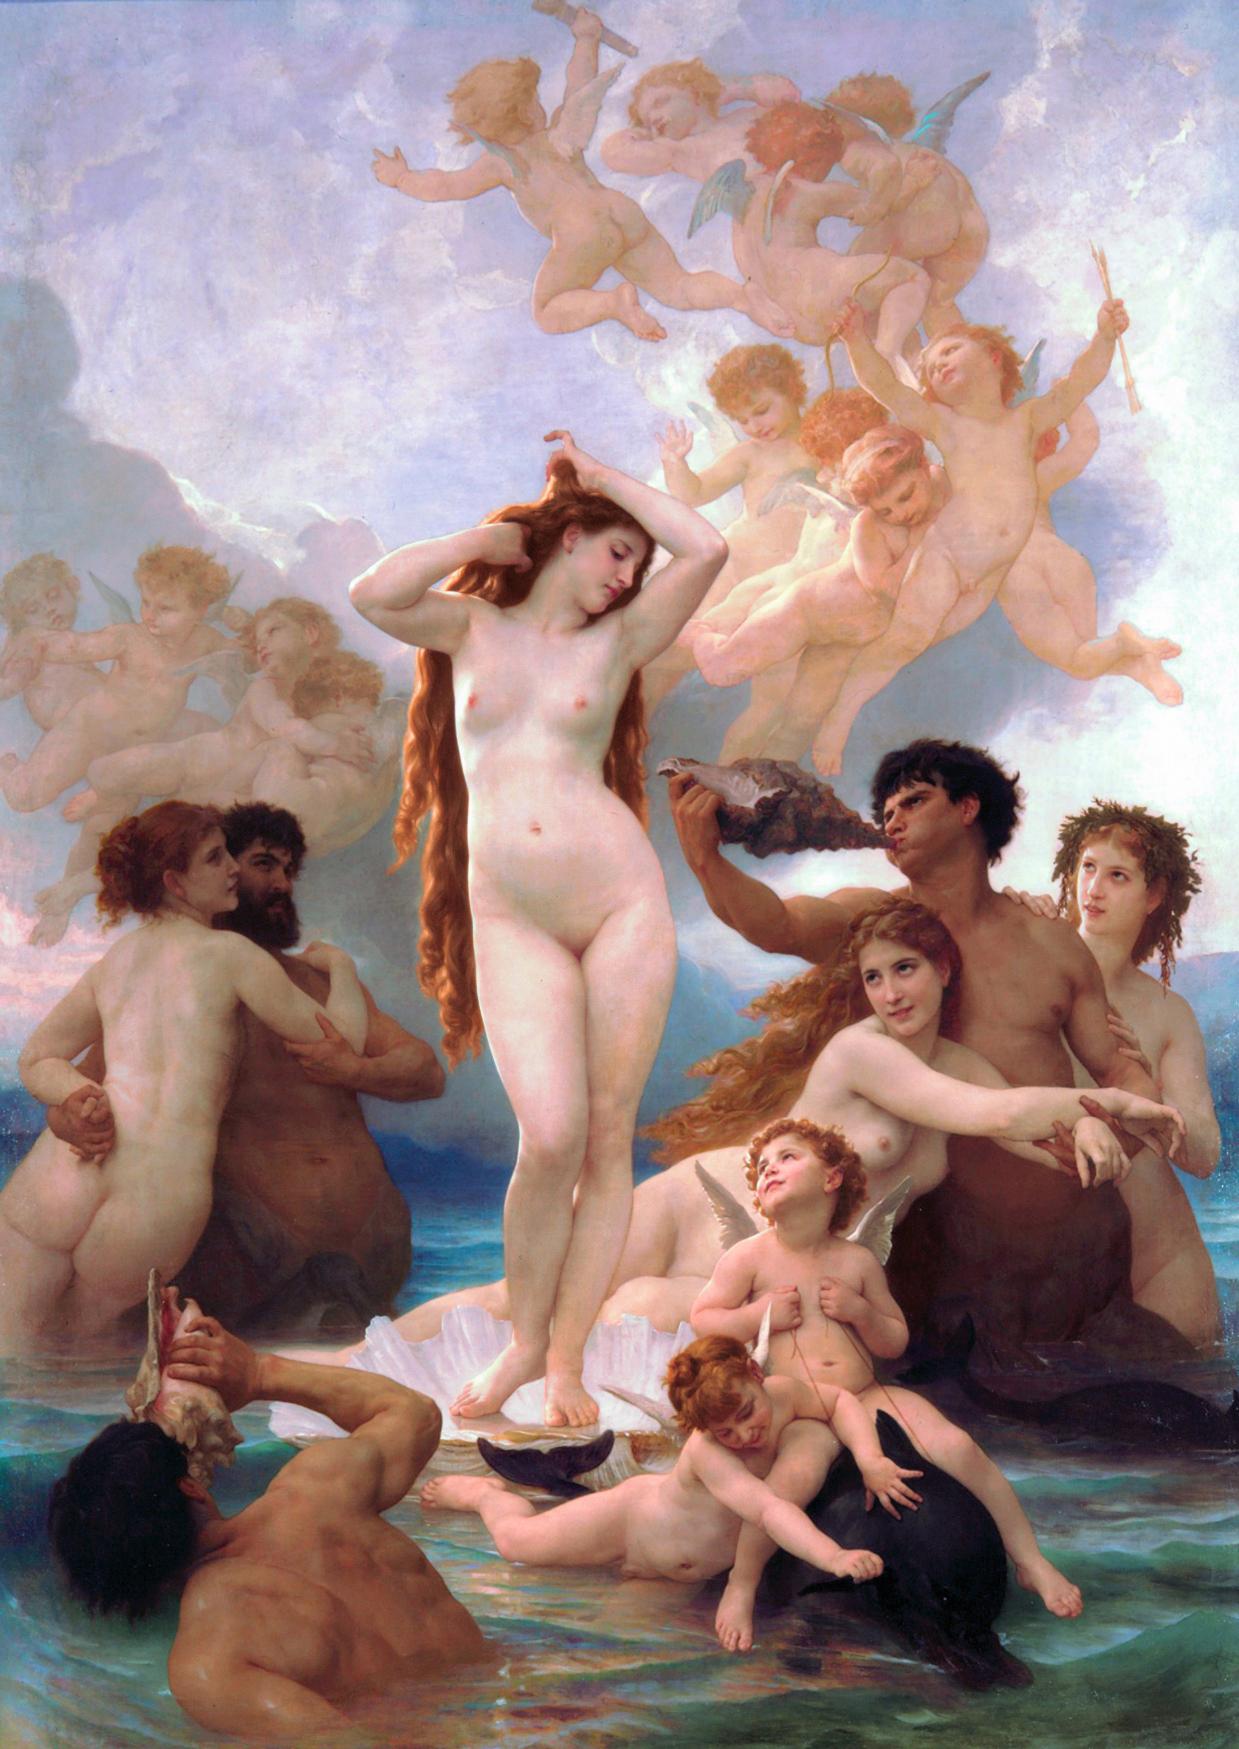 Painting: Beouguereau Birth of Venus